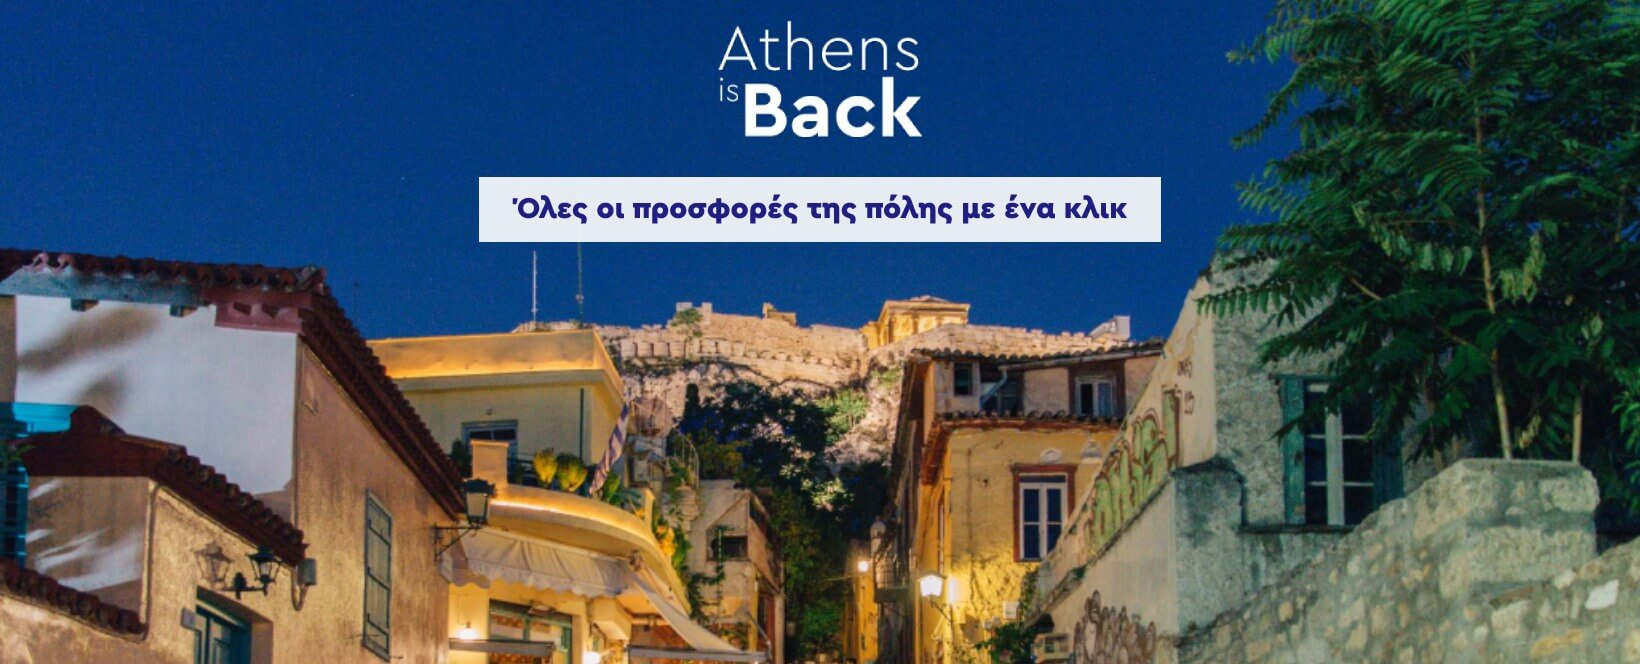 «Athens is Back»: Η πλατφόρμα του Δήμου Αθηναίων που ενισχύει επιχειρήσεις και καταναλωτές